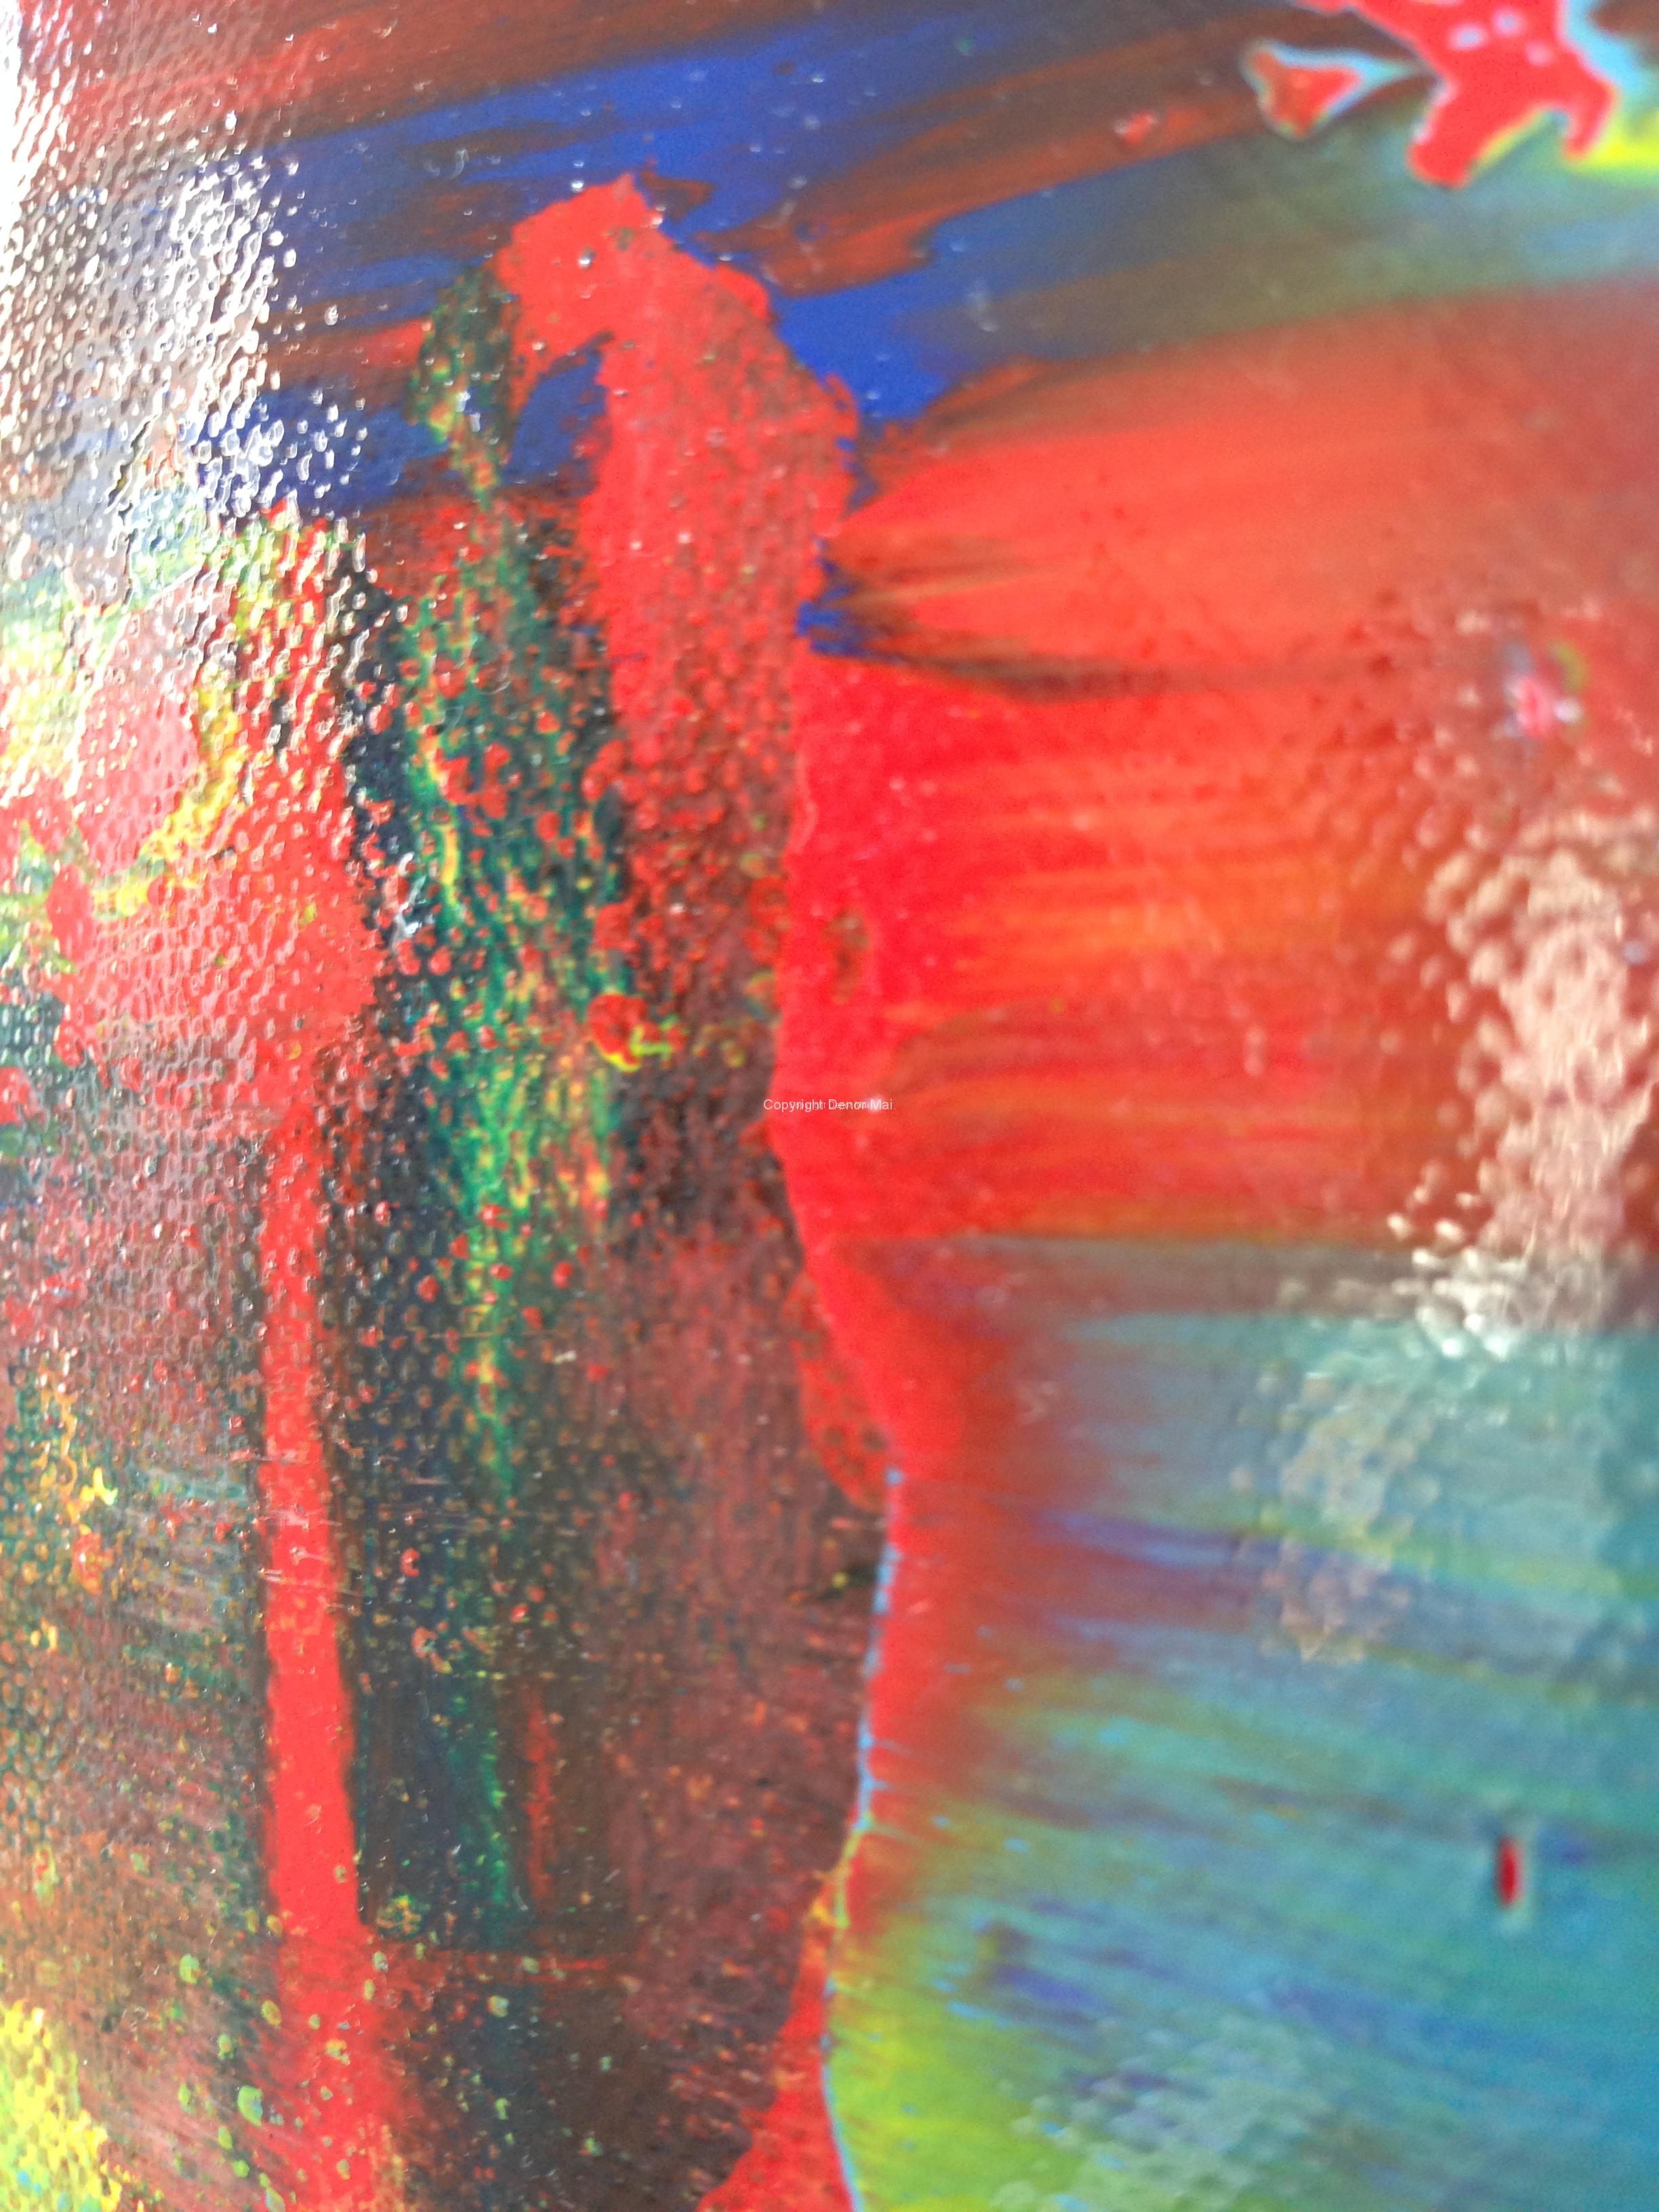 Abstrakt rot 90x70 Zomm2